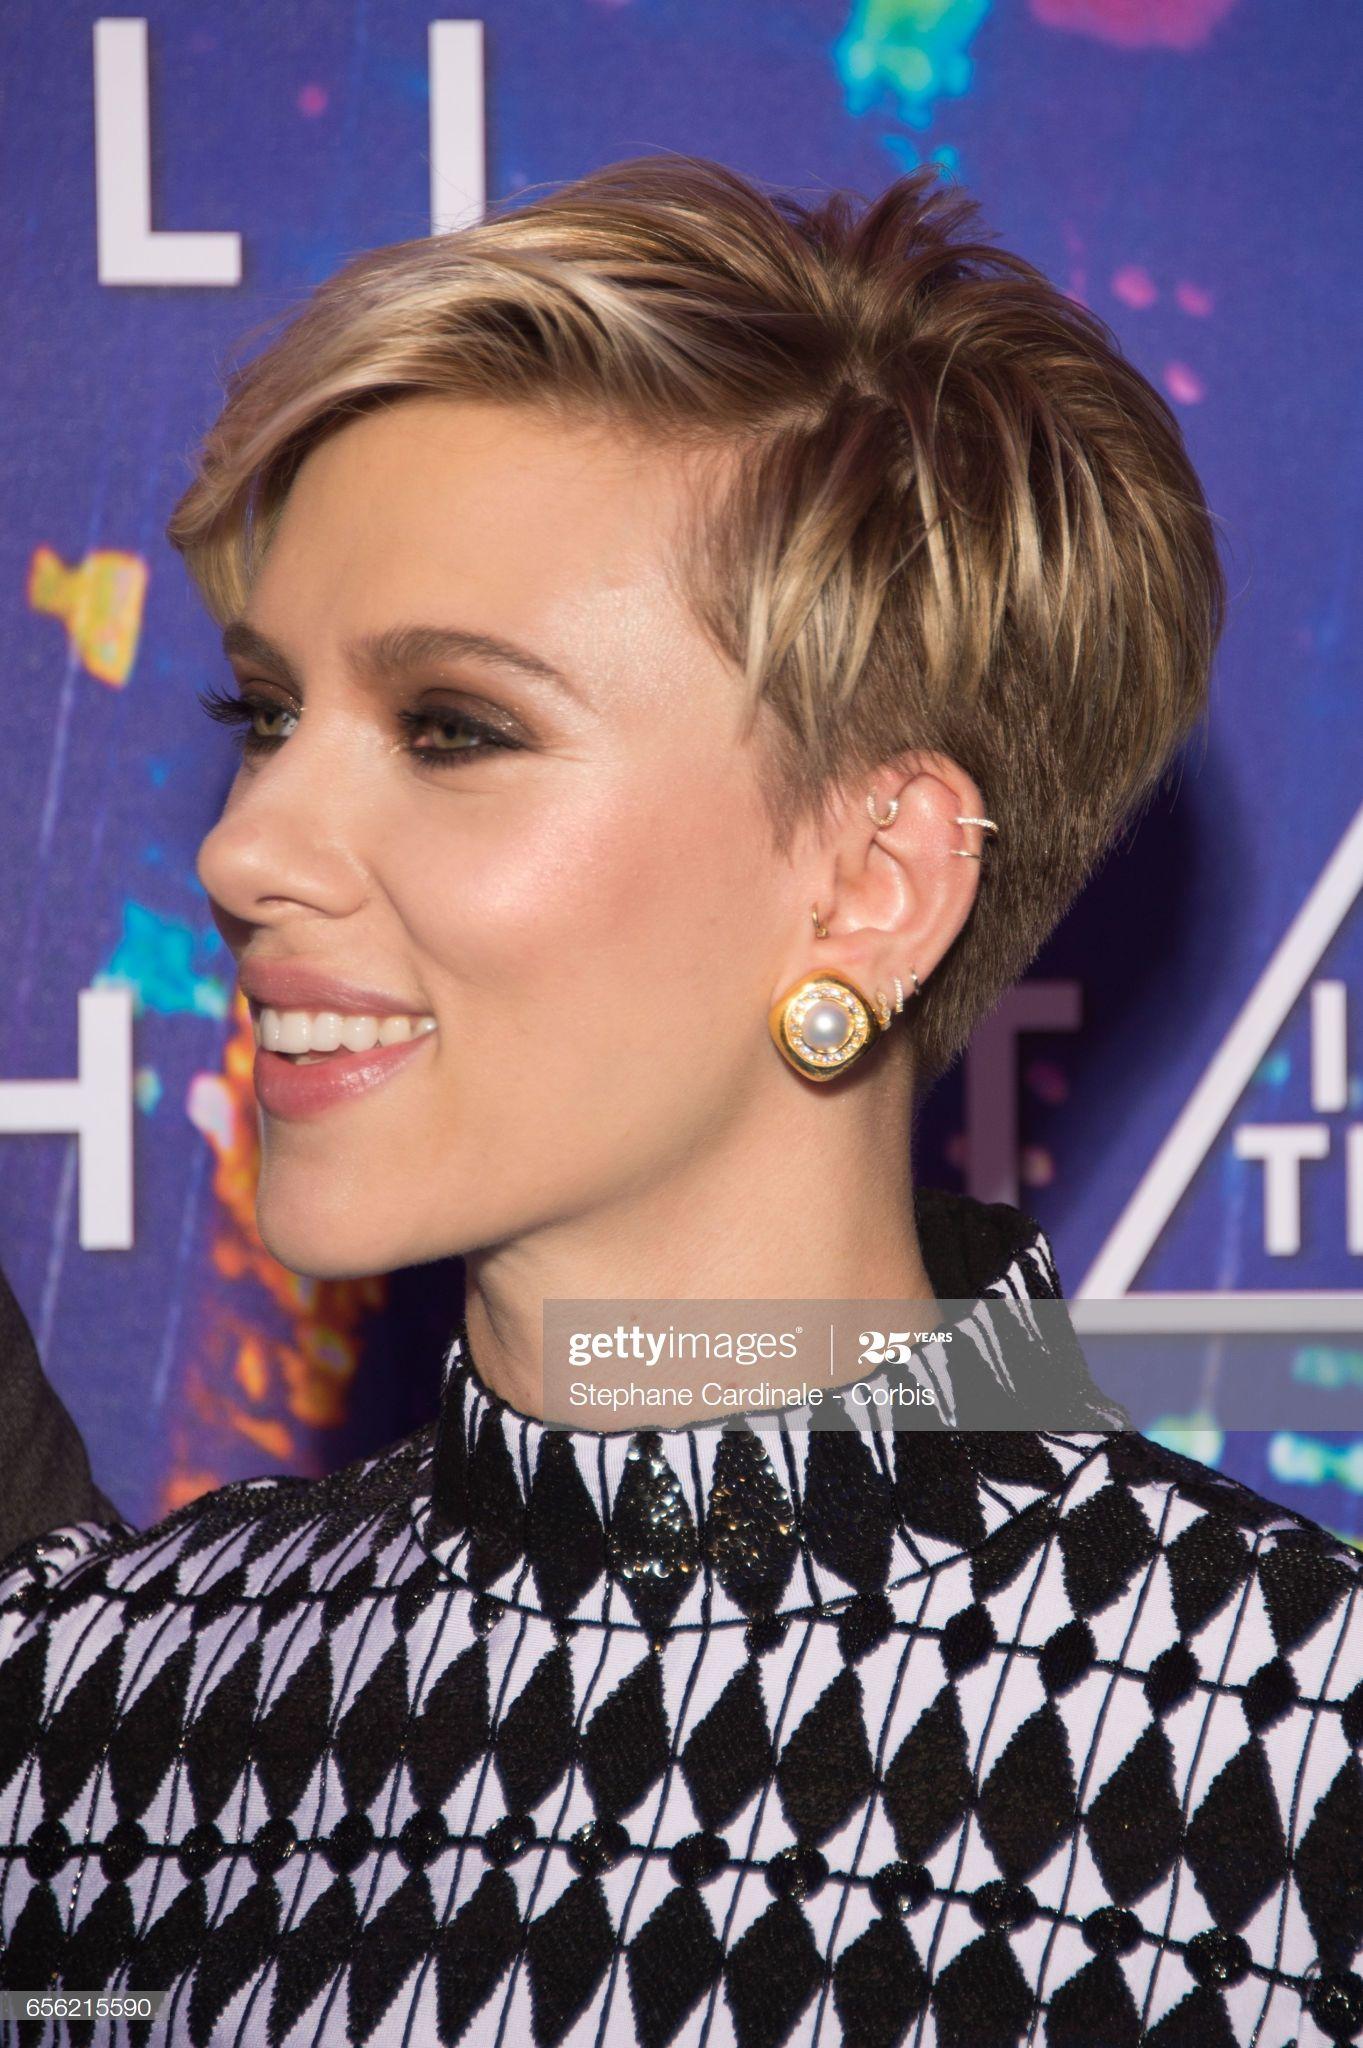 Actress Scarlett Johansson attends the Paris Premi